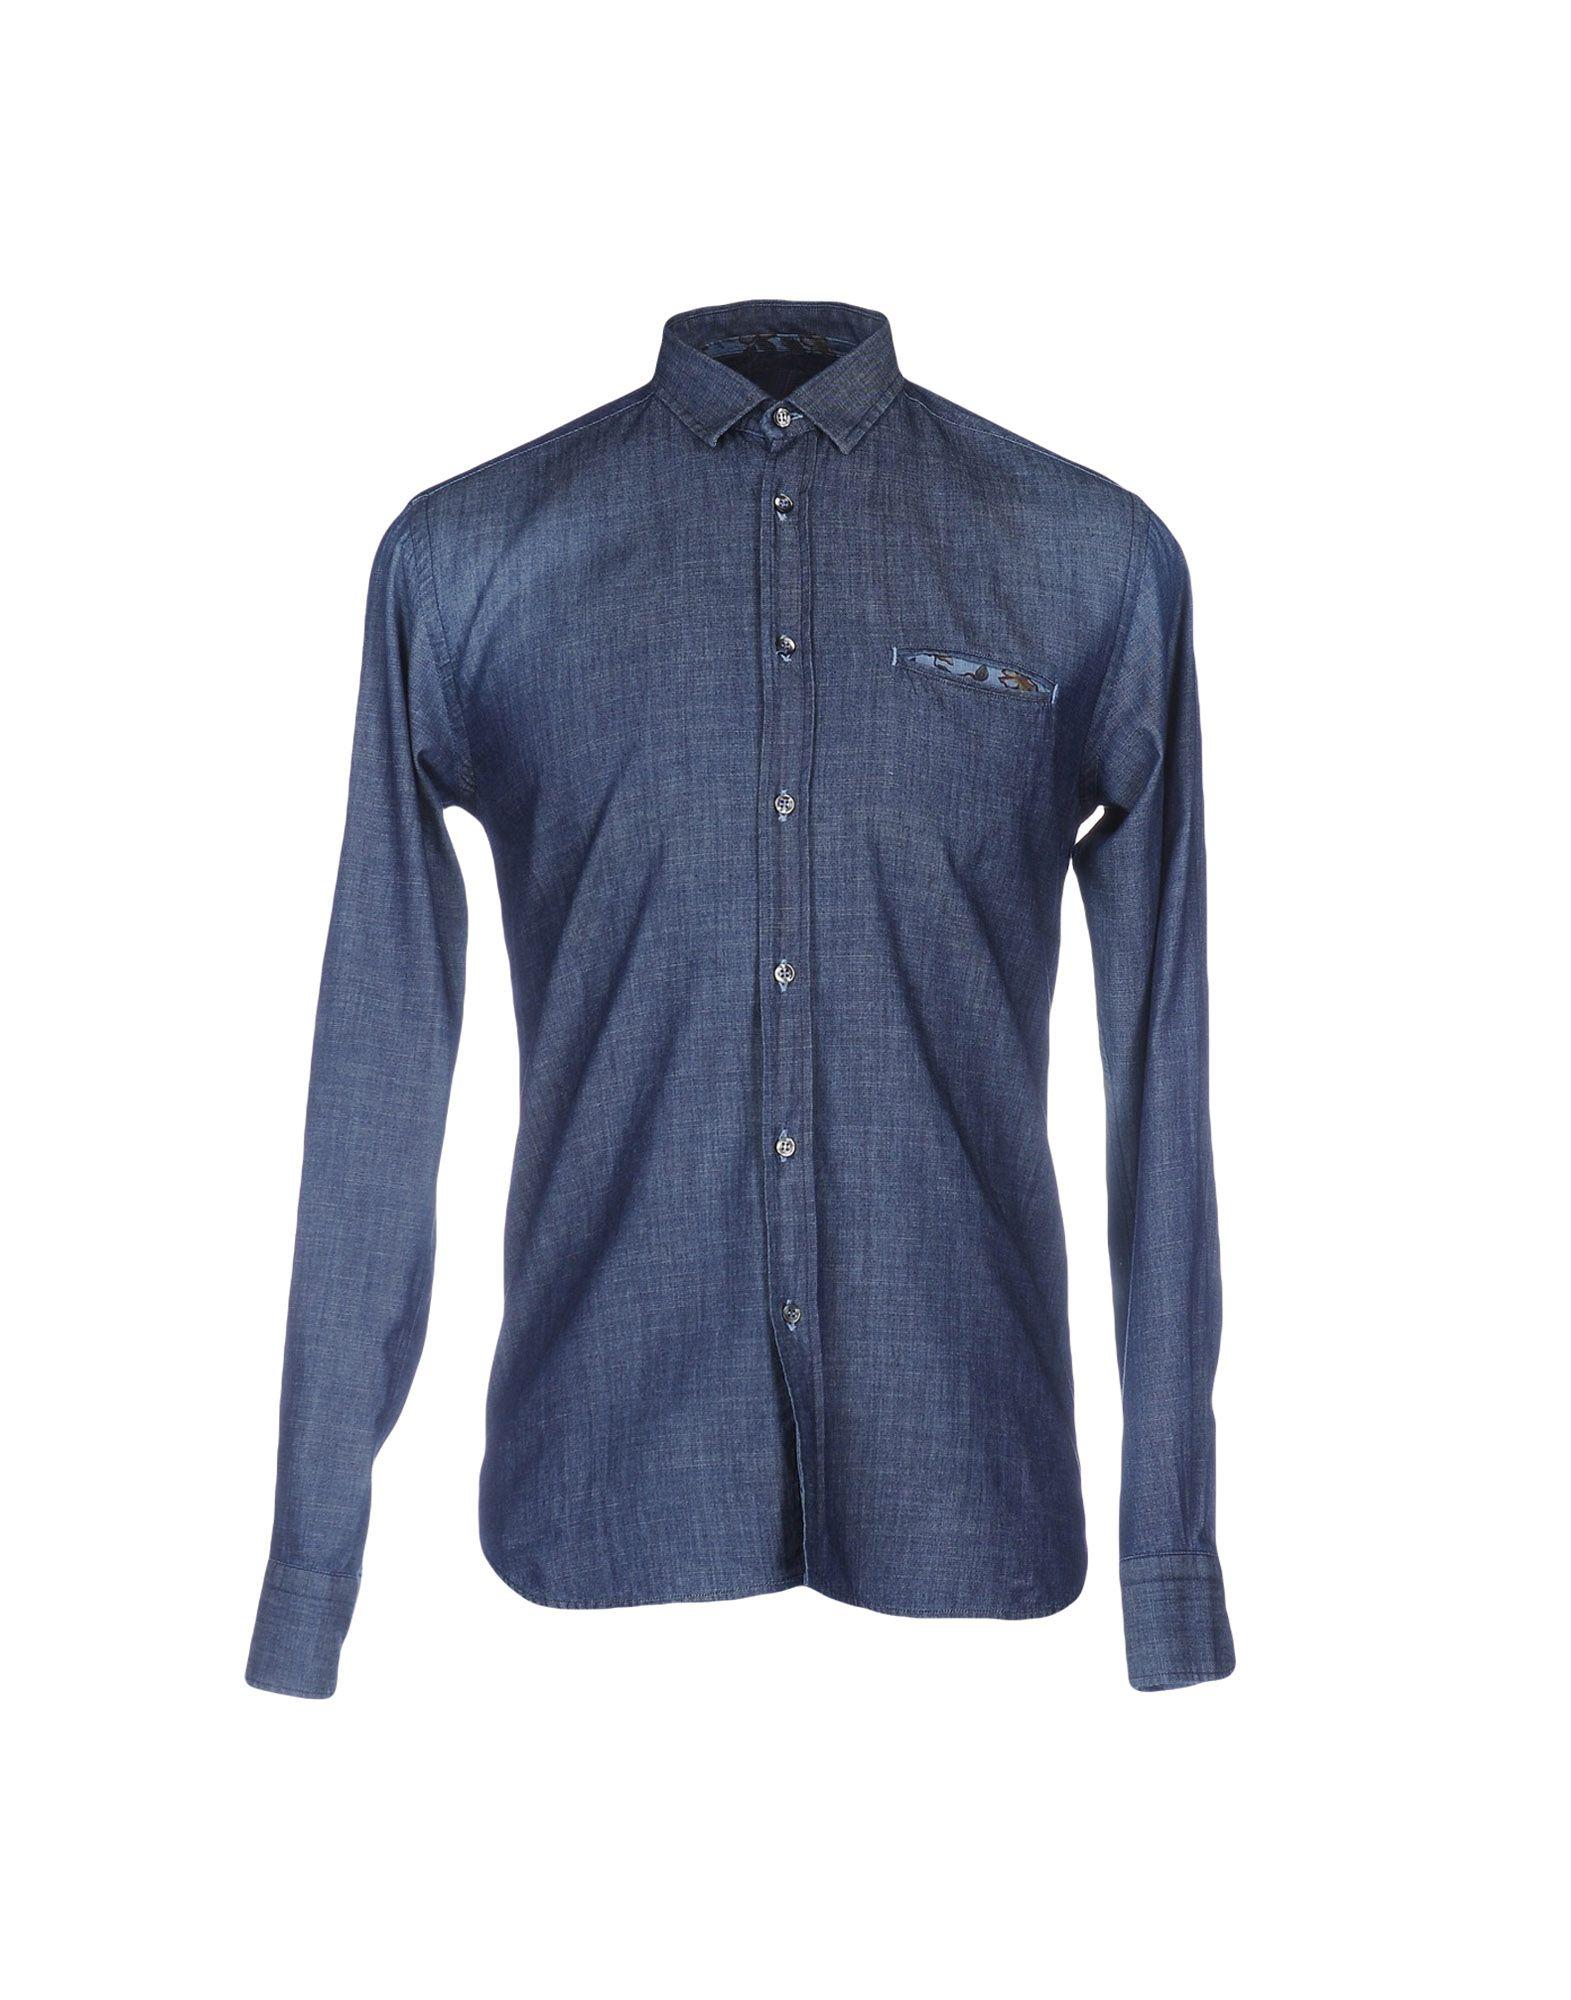 JEY COLE MAN Джинсовая рубашка